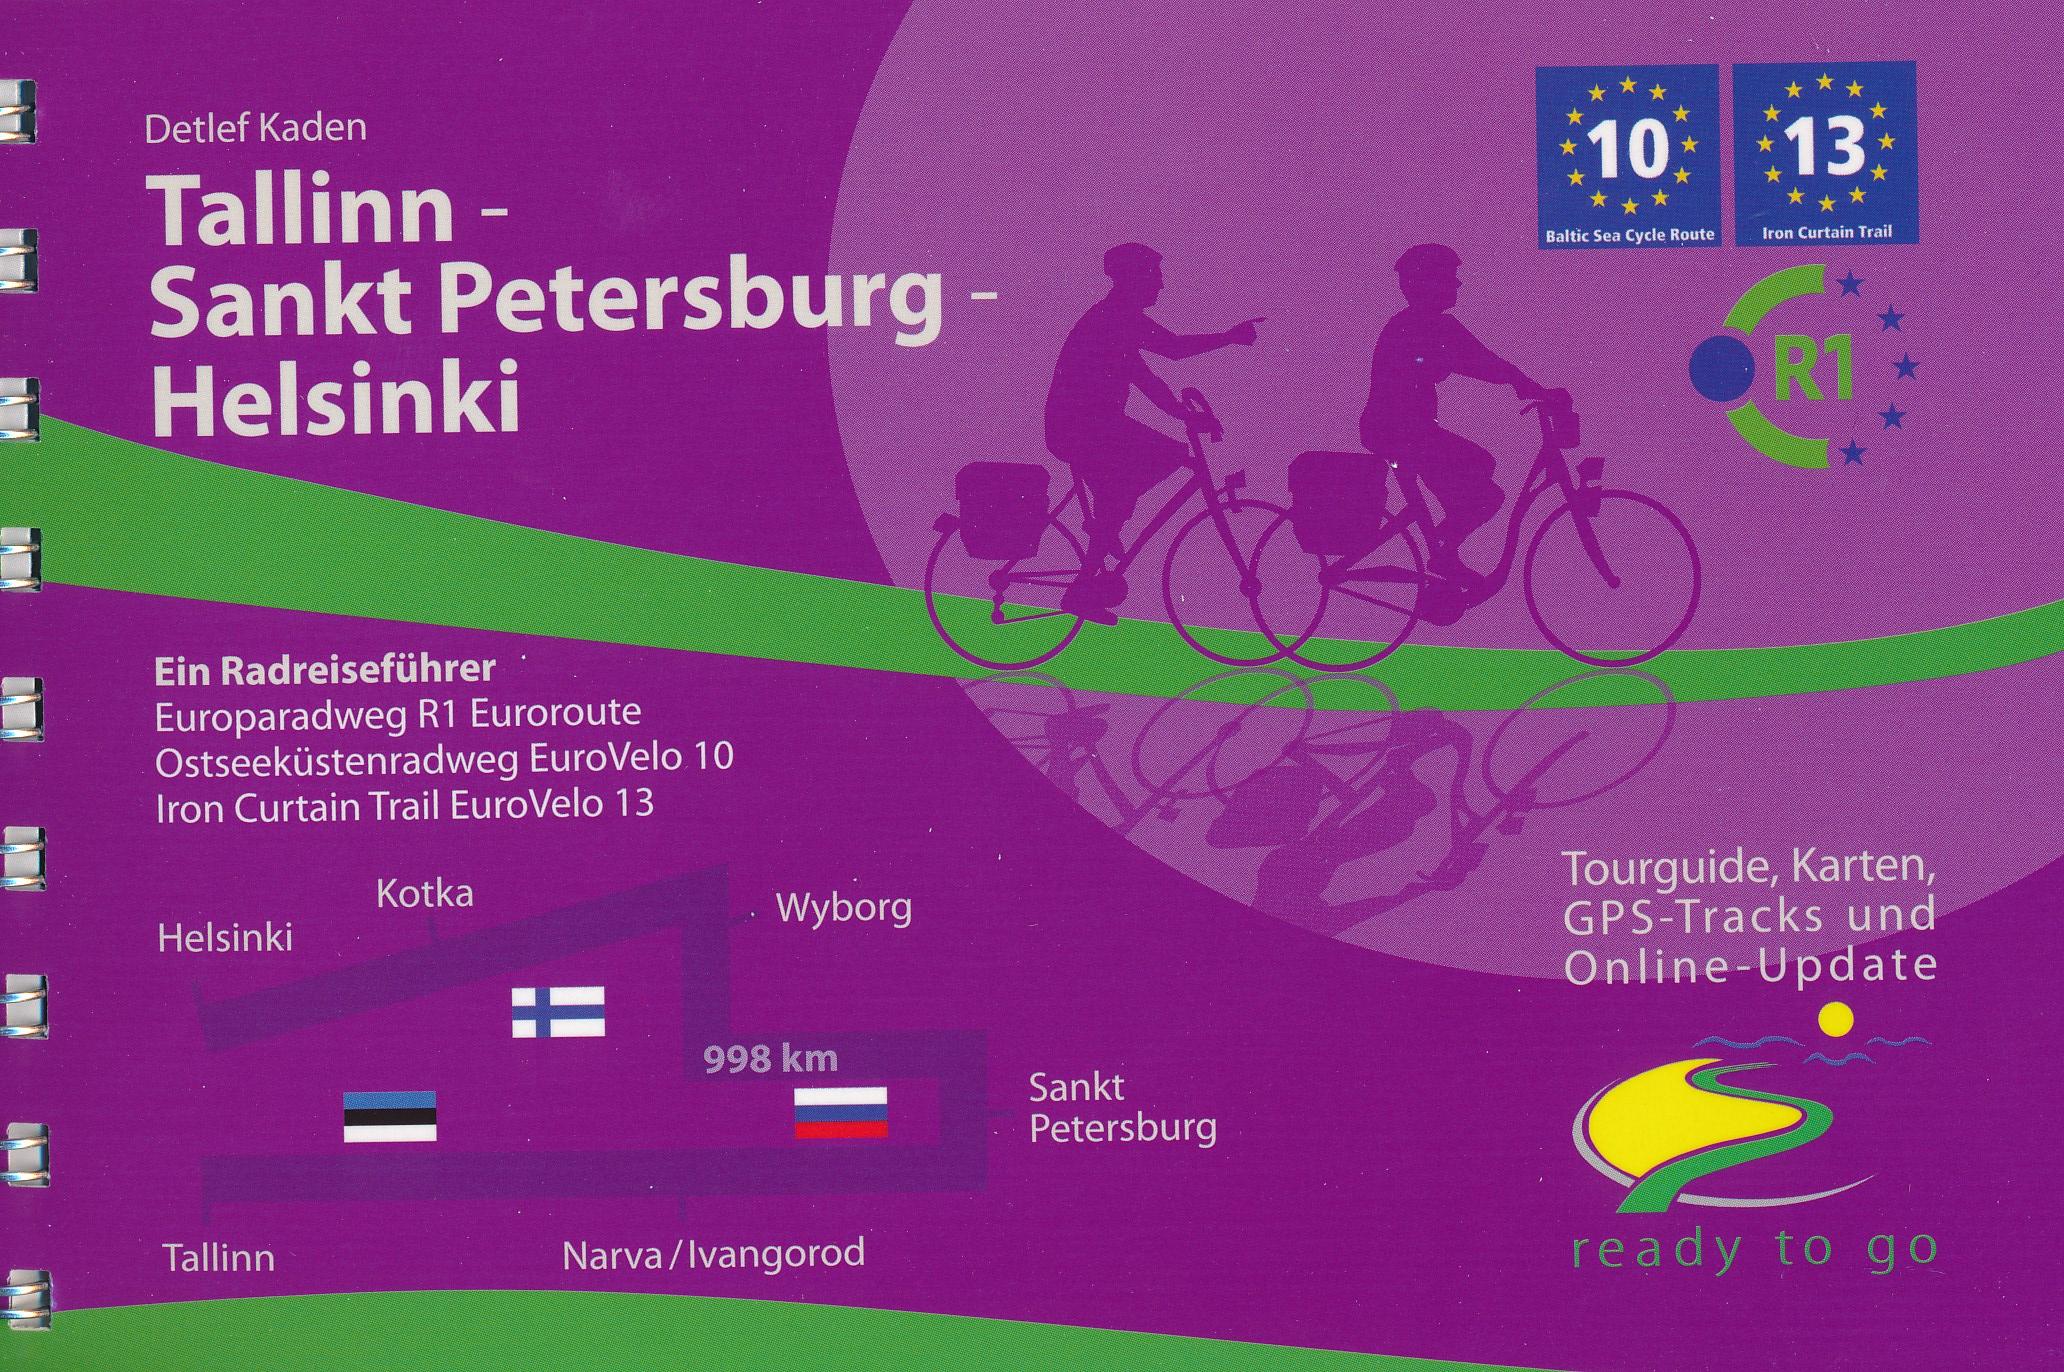 Fietsgids Tallinn - Sankt Petersburg - Helsinki - Radreiseführer | IS Radweg